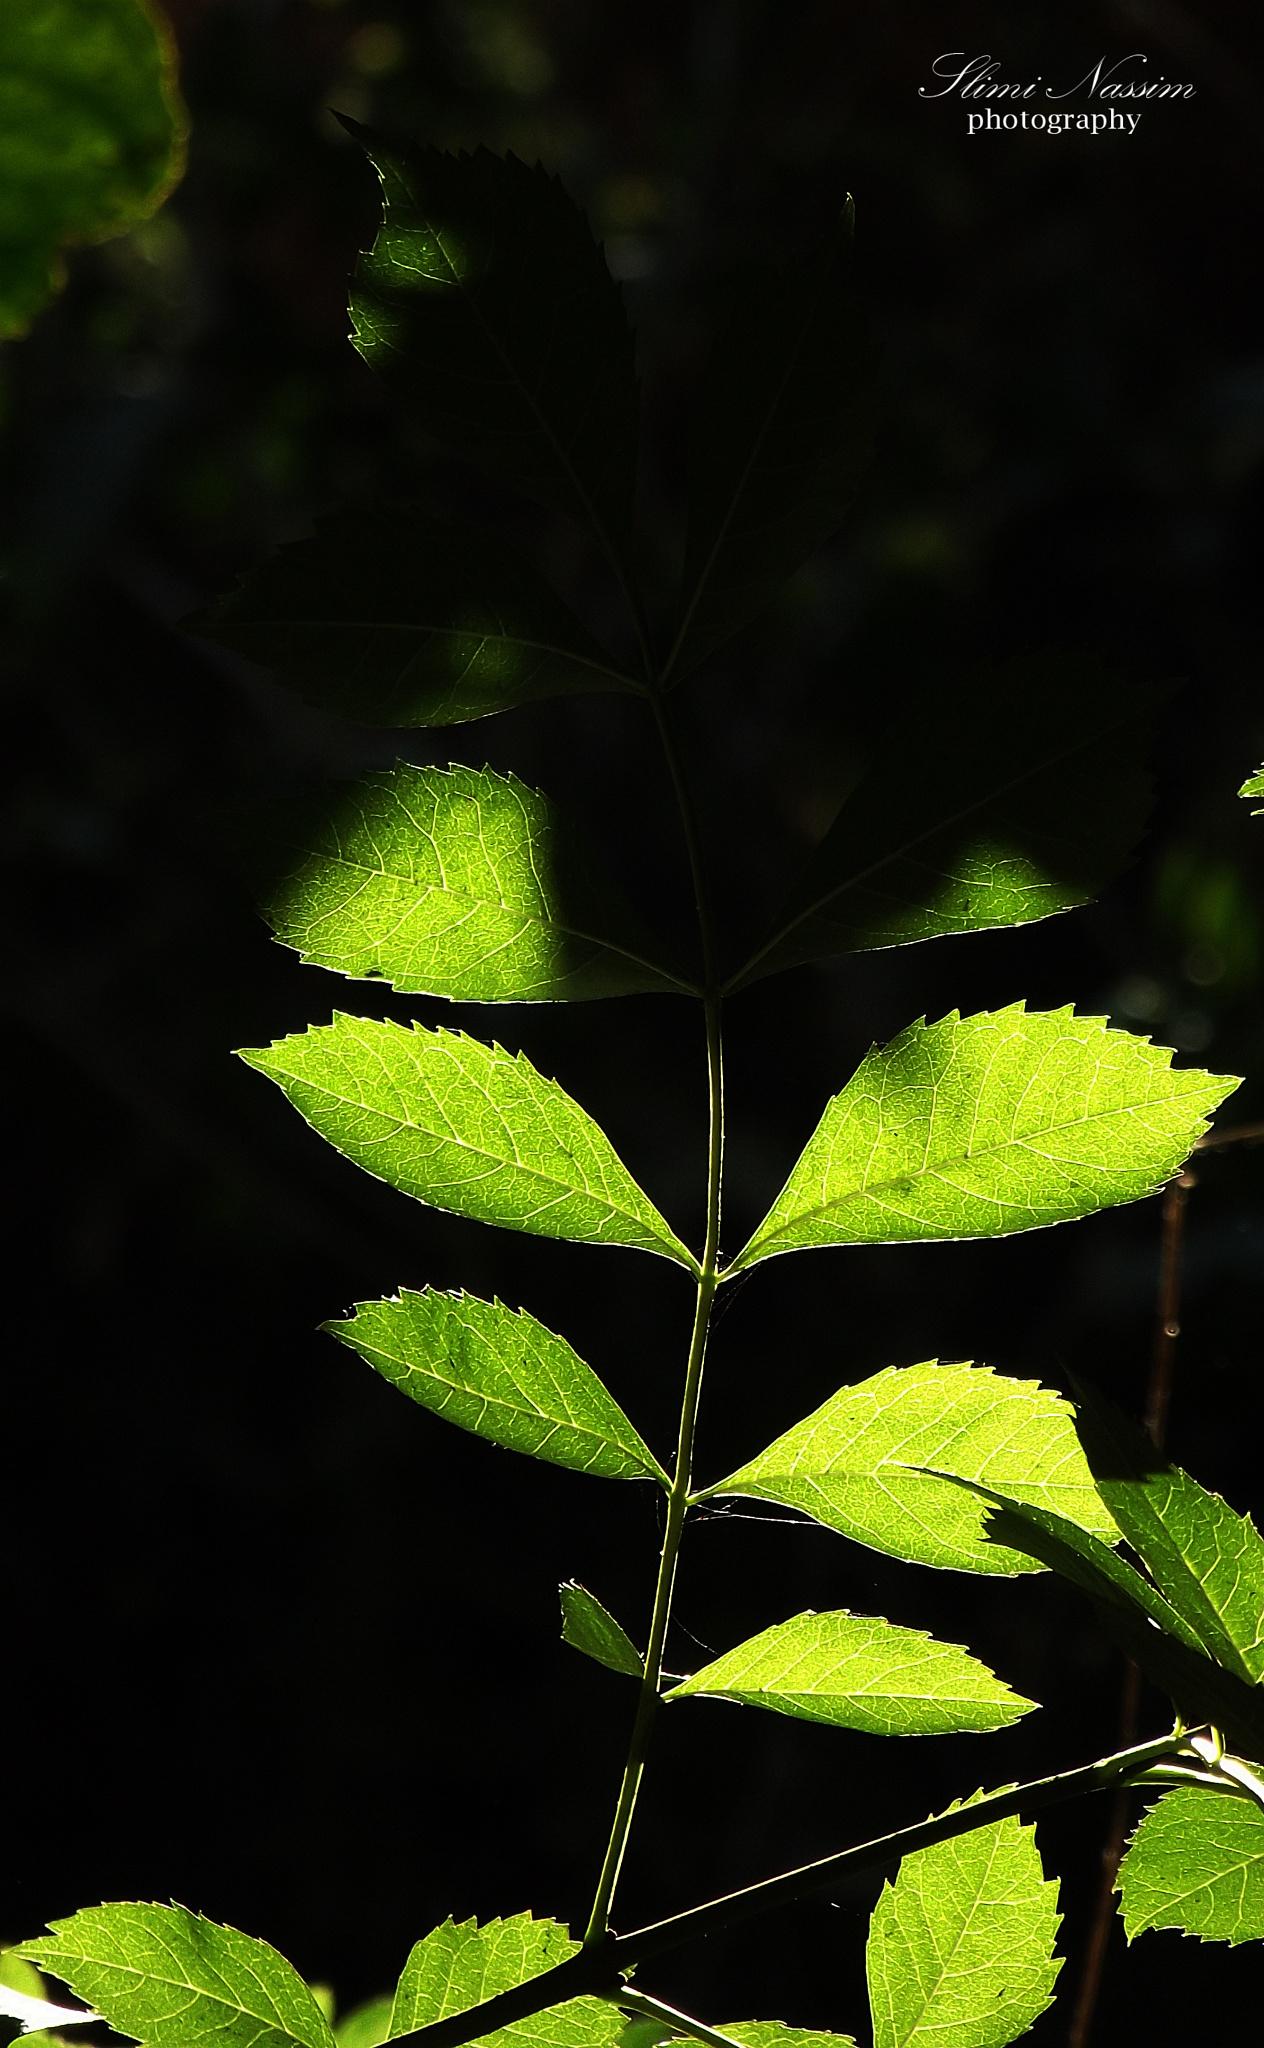 greenleaf by Nassim Slimi